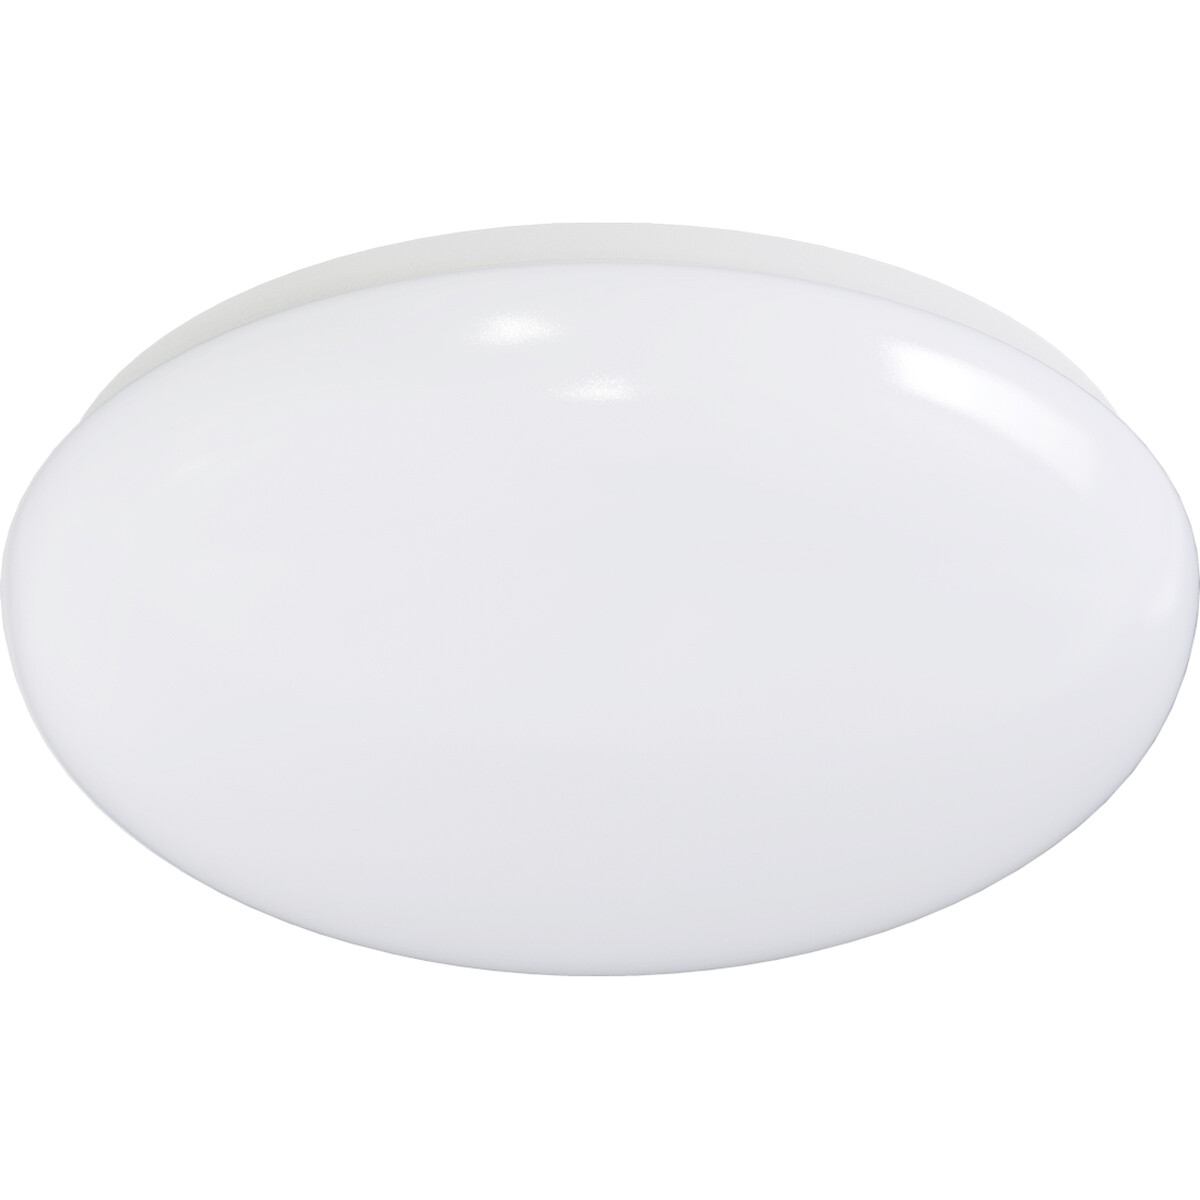 LED Plafondlamp - Aigi Arory - Opbouw Rond - 12W - Helder/Koud Wit 6300K - Mat Wit - Kunststof